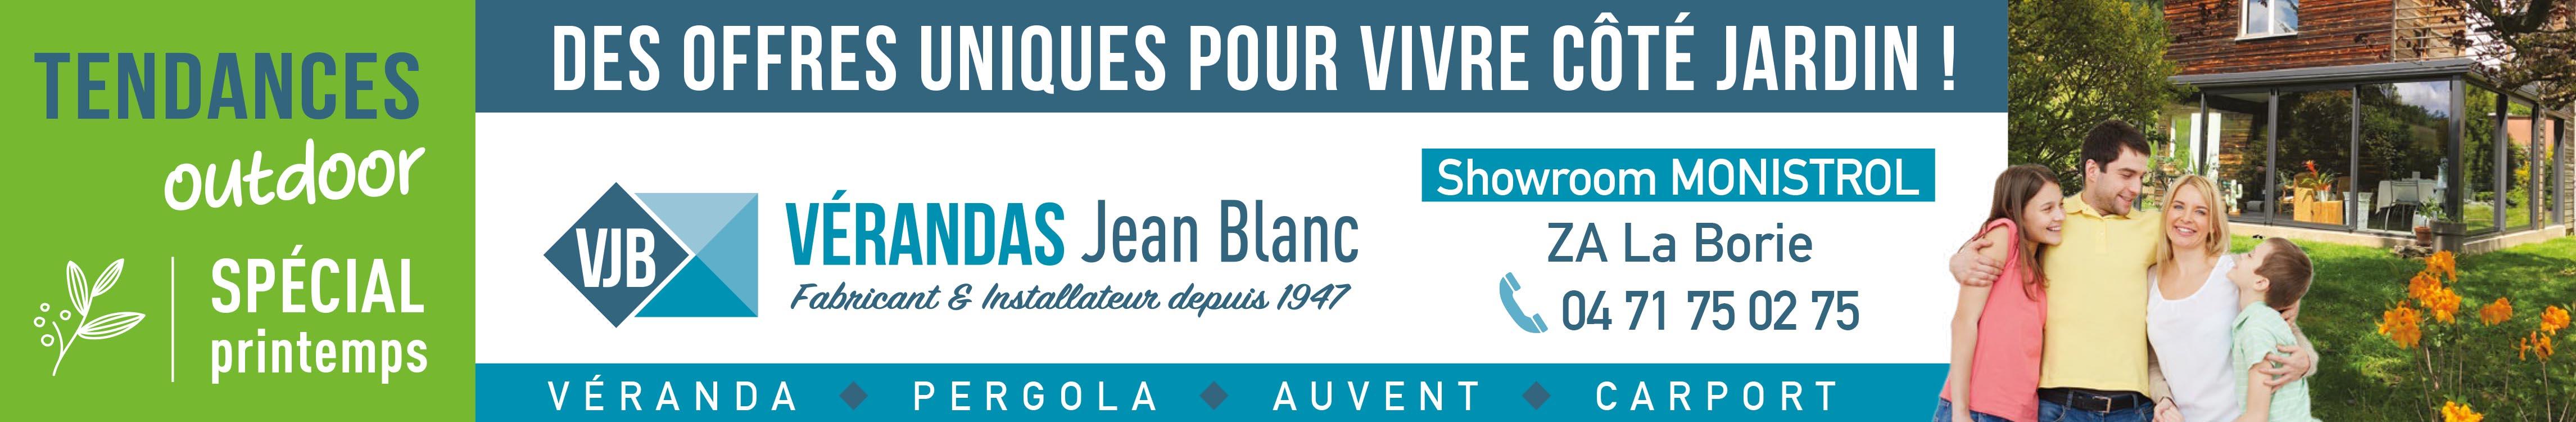 Vérandas Jean Blanc mars 2021